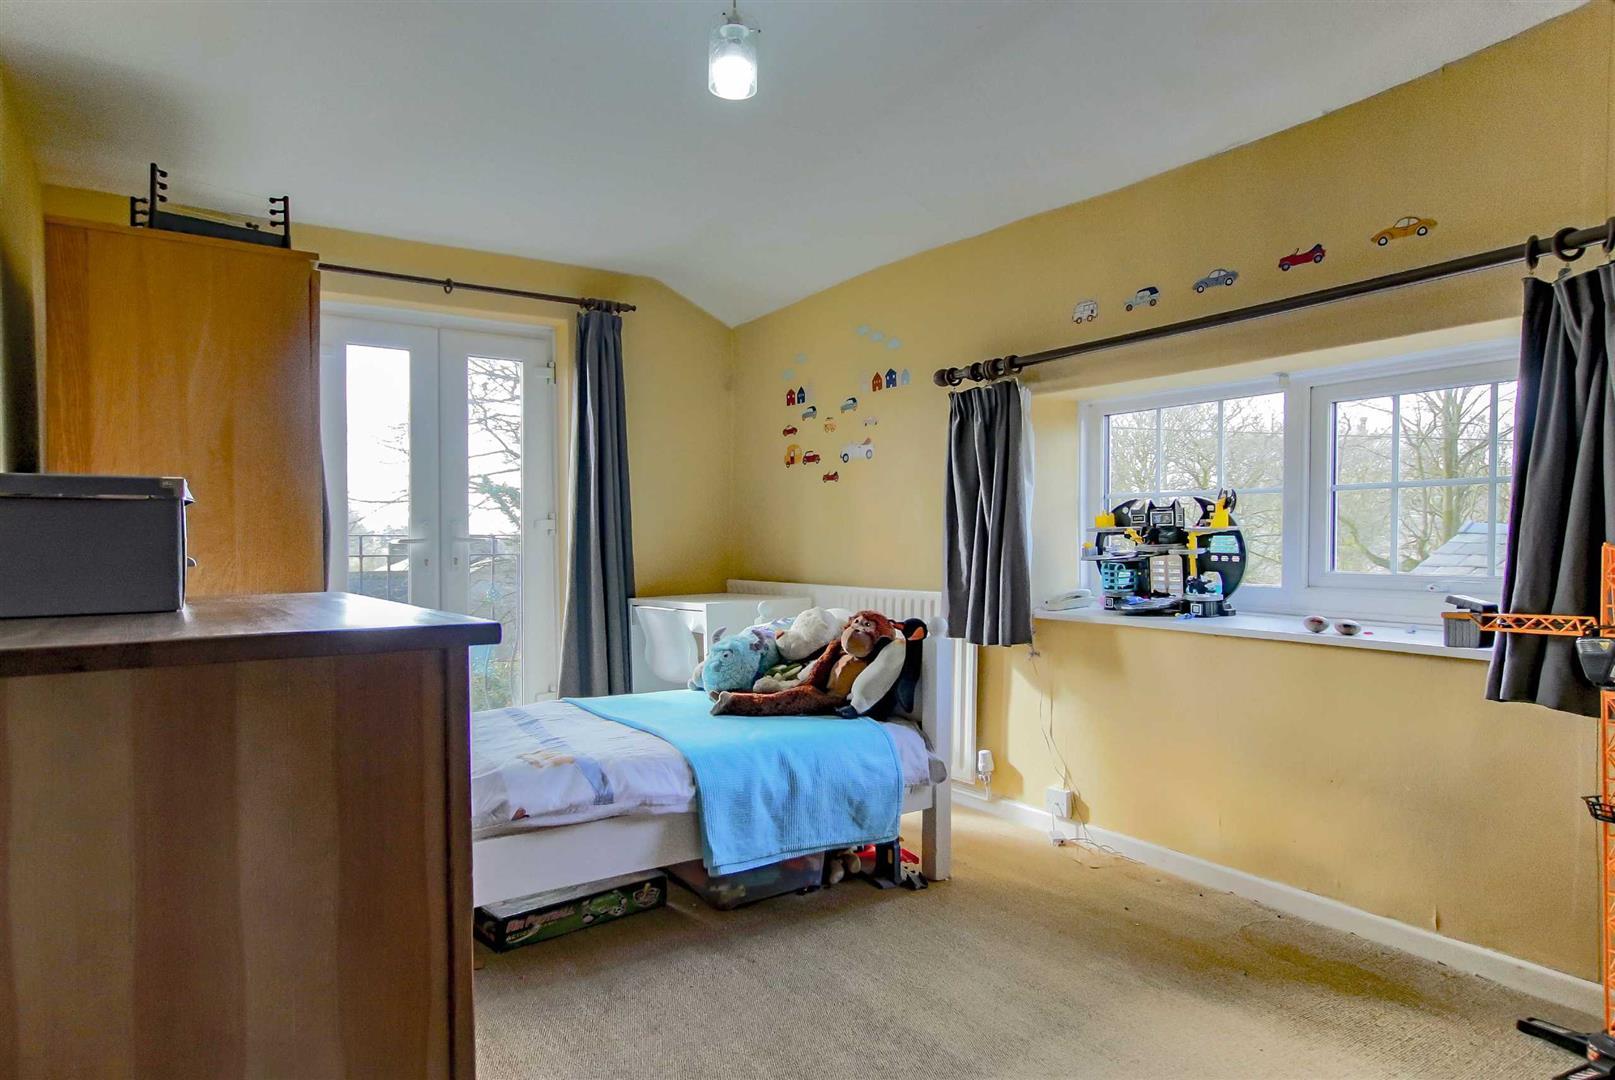 4 Bedroom Detached House For Sale - p033686_07.jpg